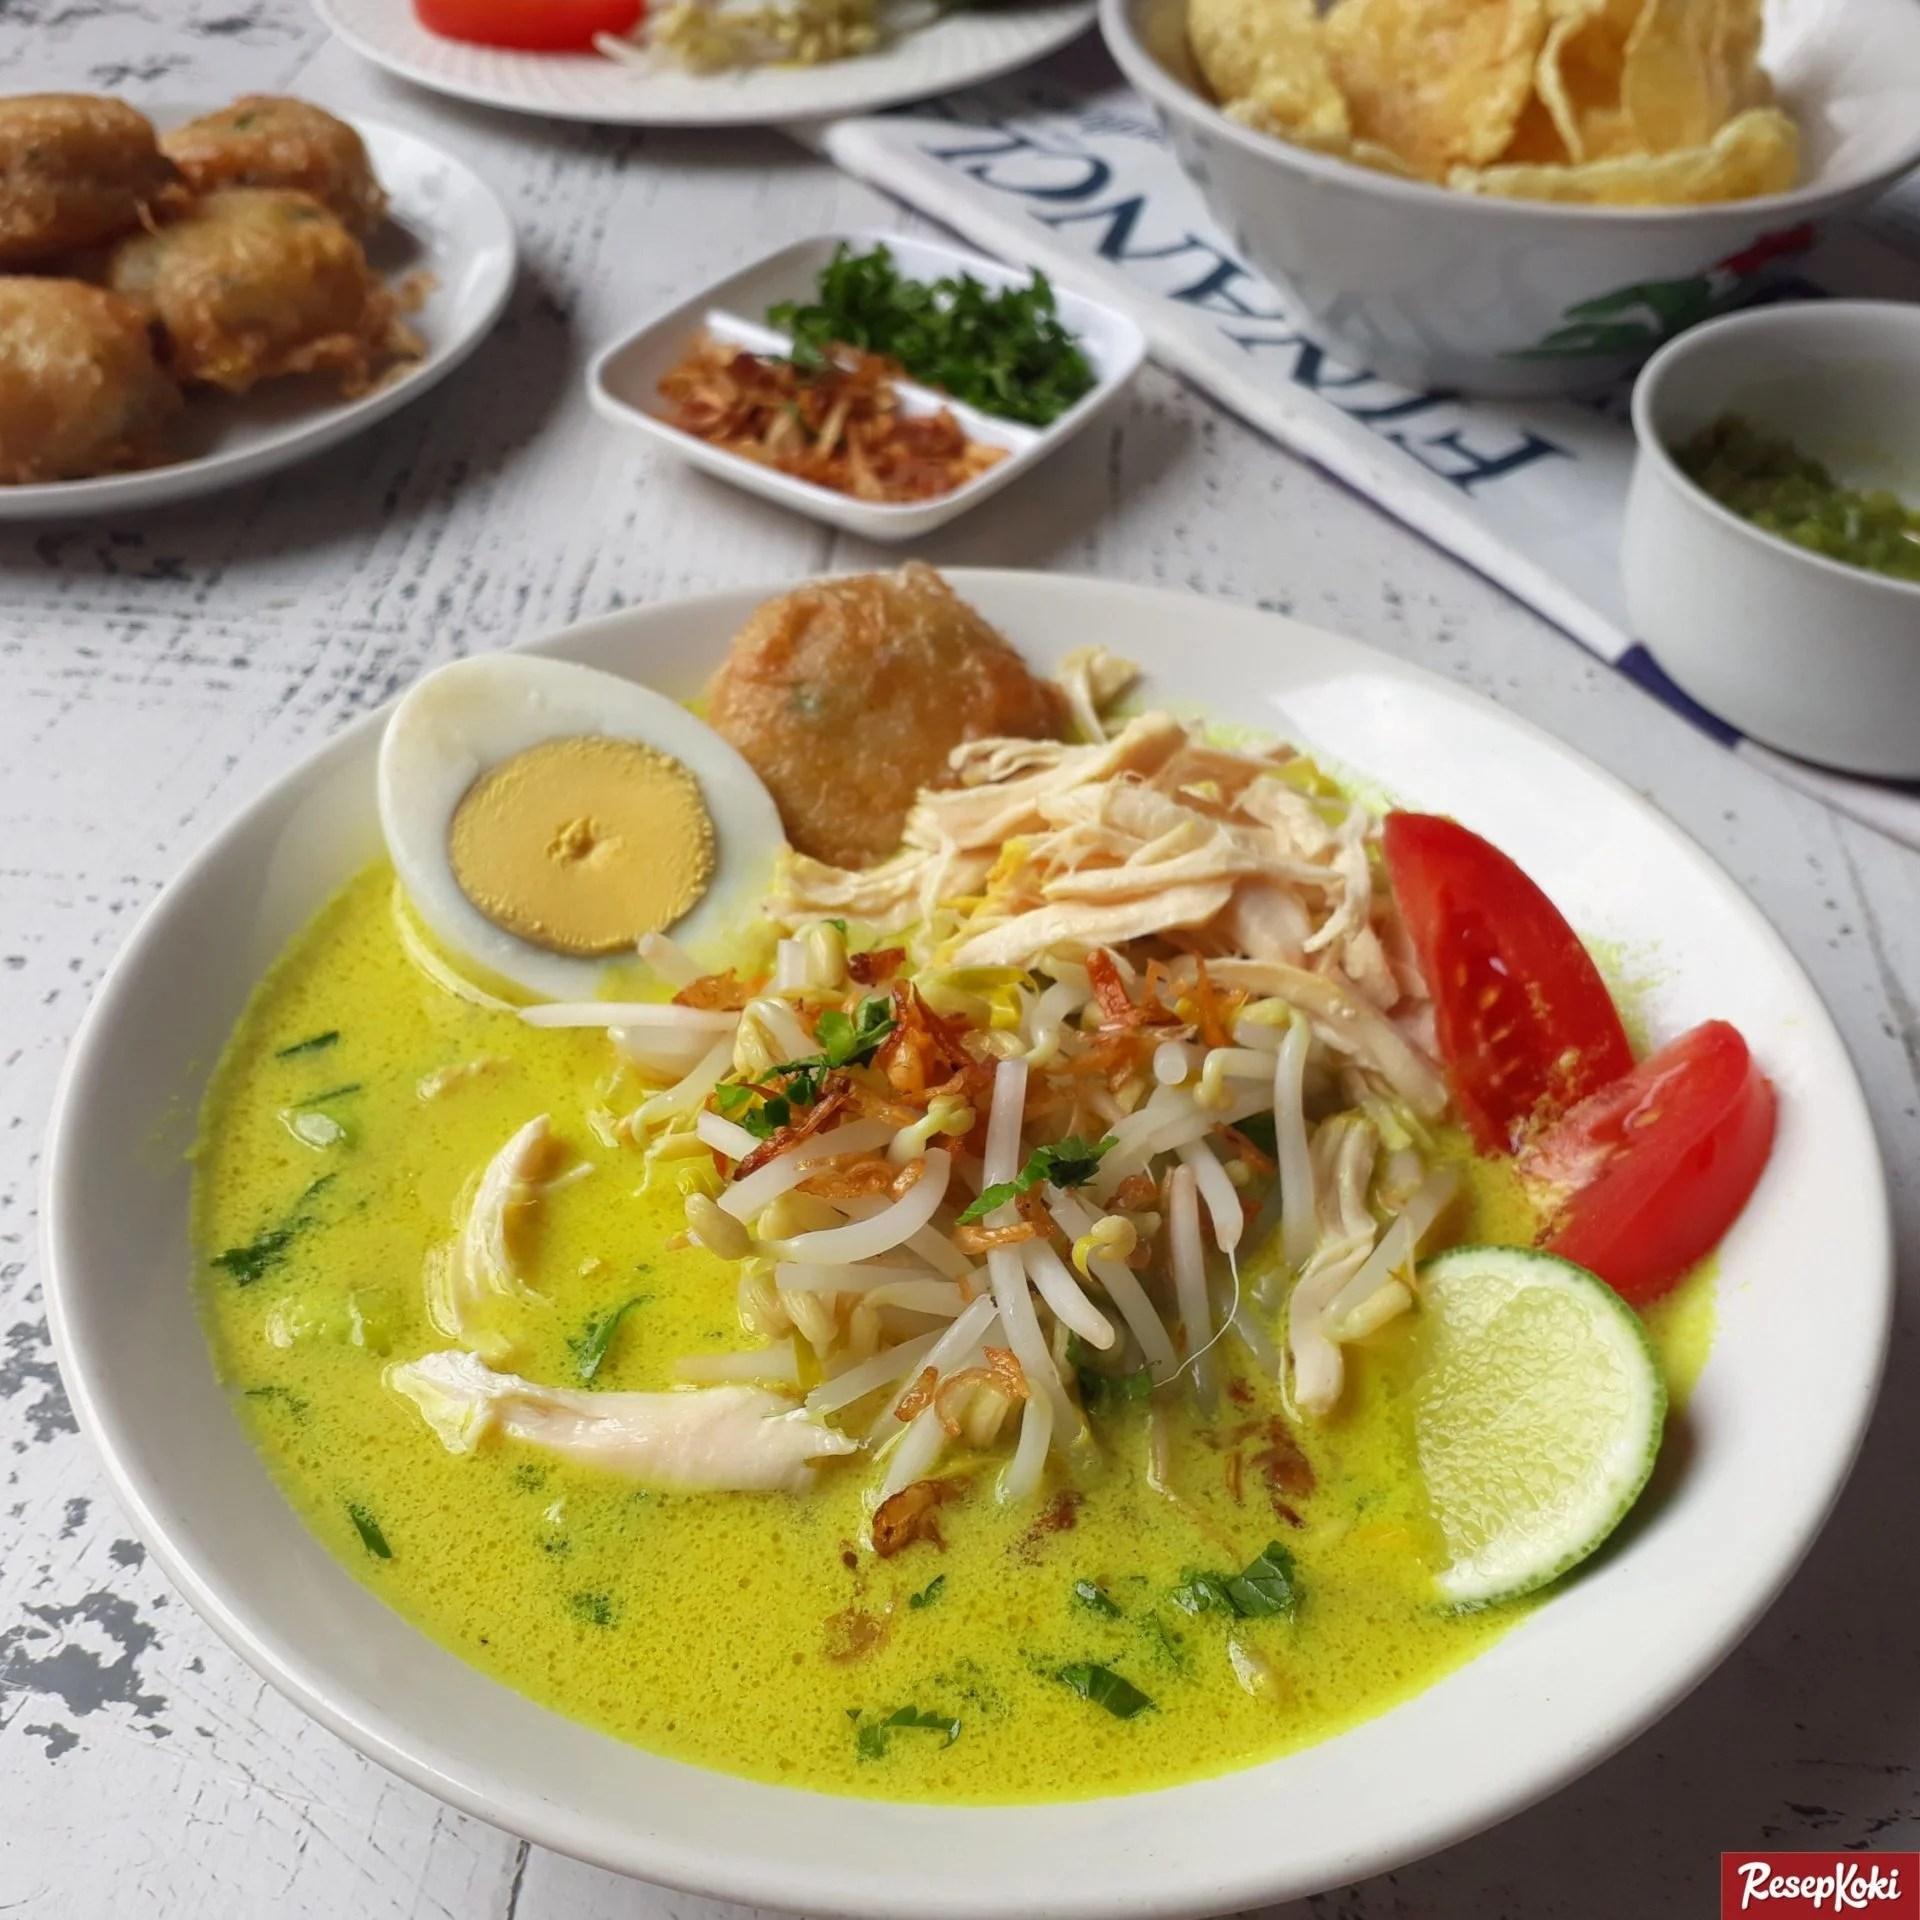 Soto Ayam Santan Khas Medan Praktis dan Istimewa - Resep | ResepKoki